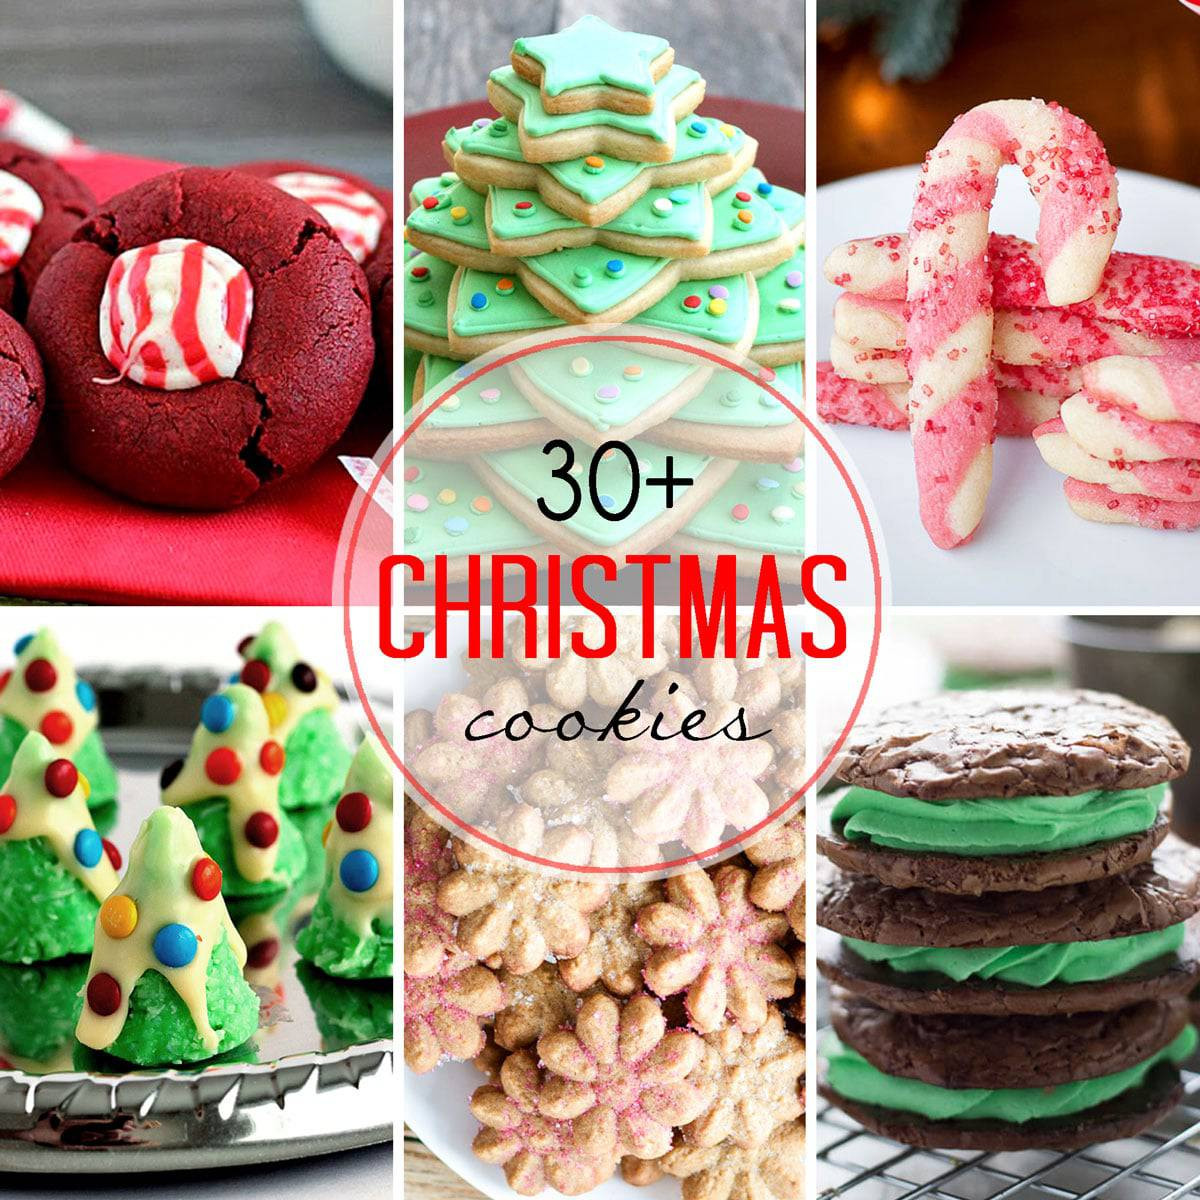 Recipes Christmas Cookies  30 Plus Festive Christmas Cookie Recipes — Let s Dish Recipes